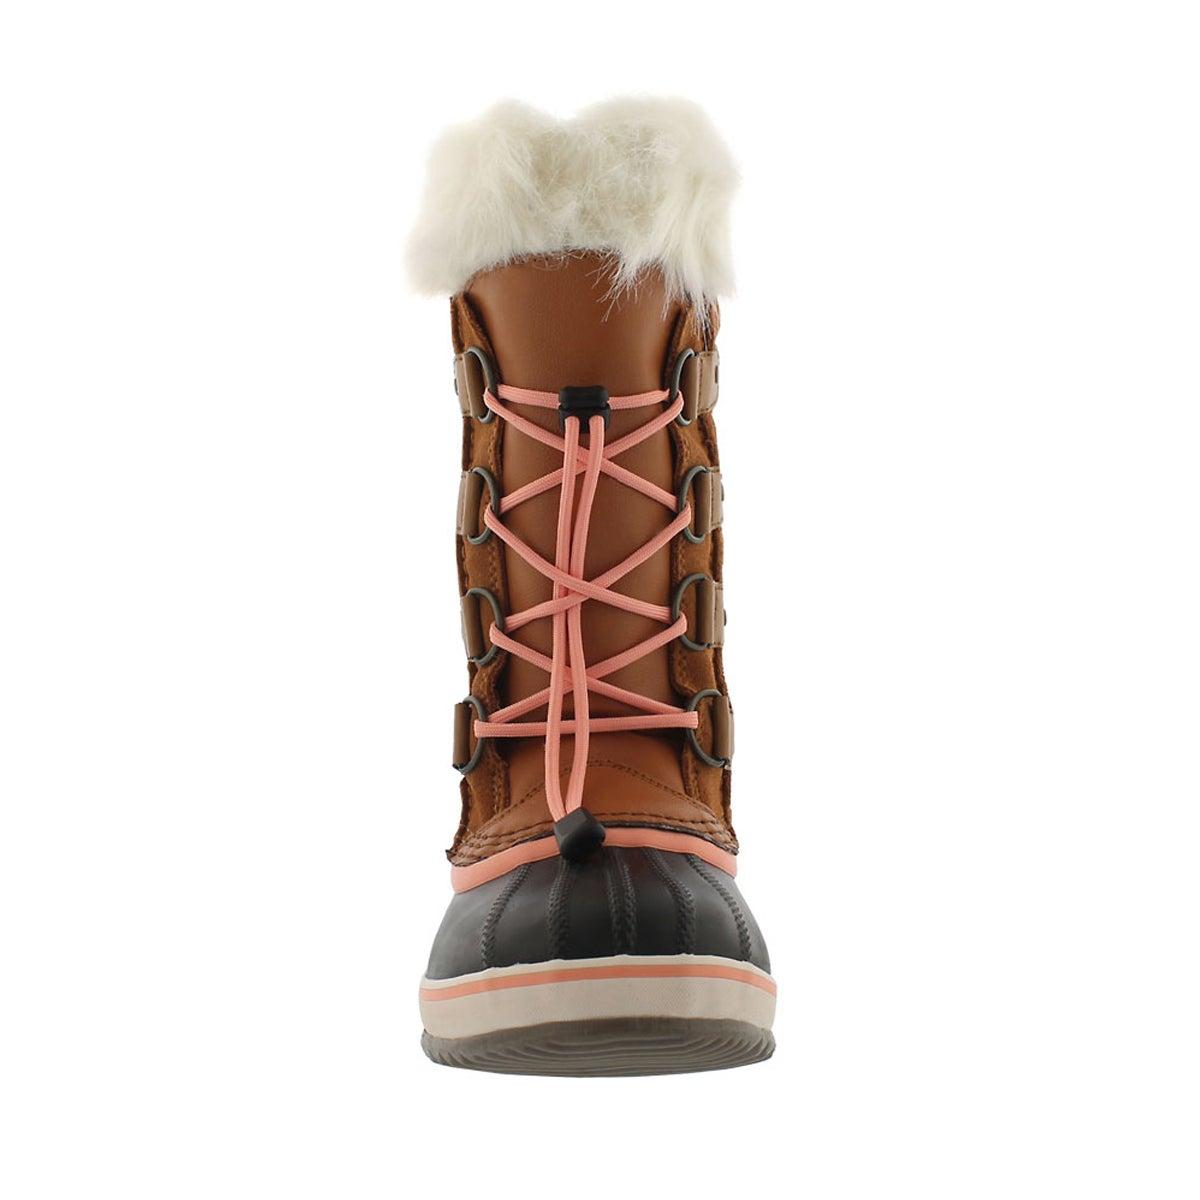 Grls Joan Of Arctic caramel winter boot